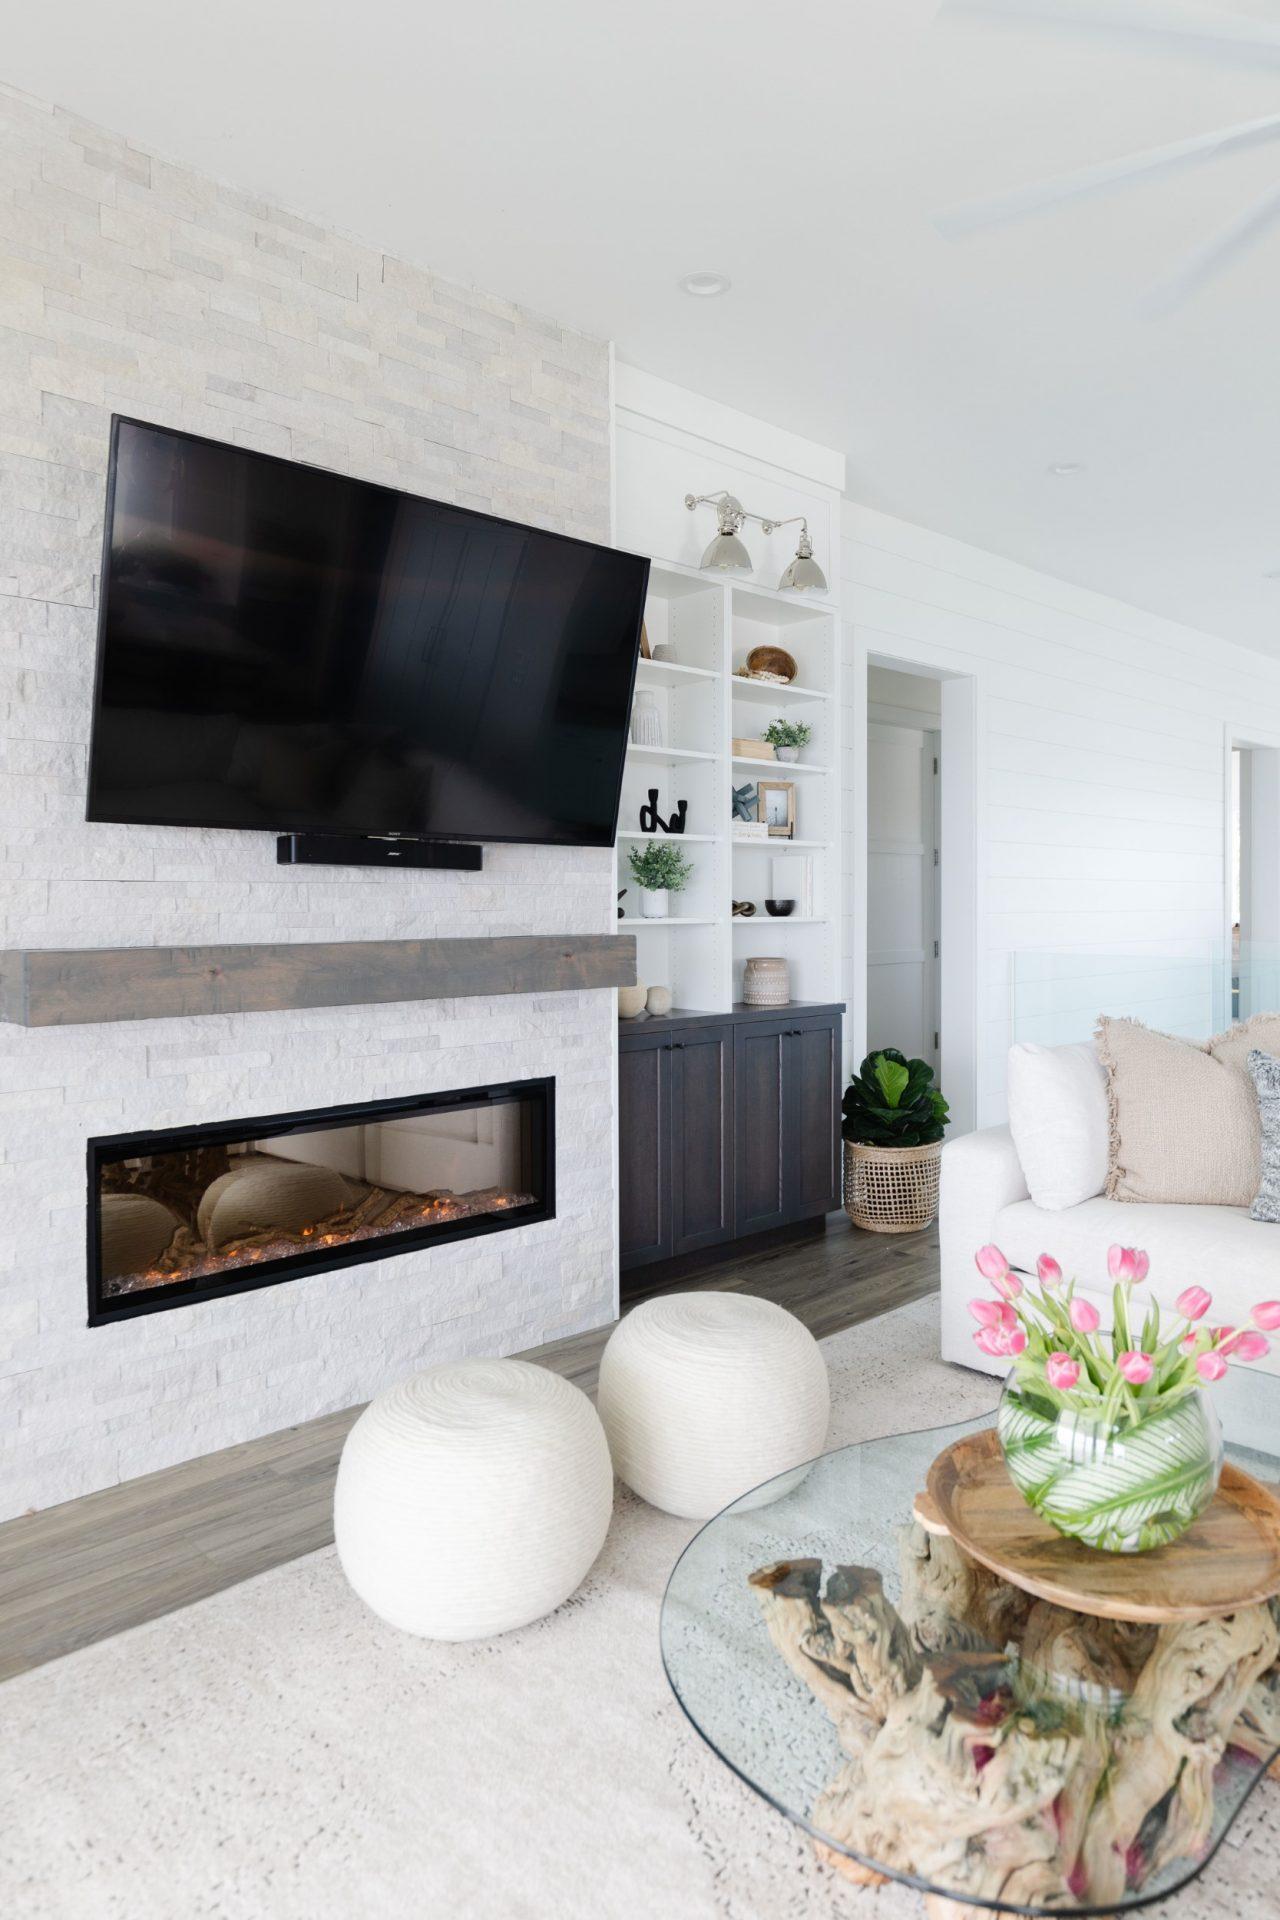 Peet's Perch | Living Room TV & Fireplace